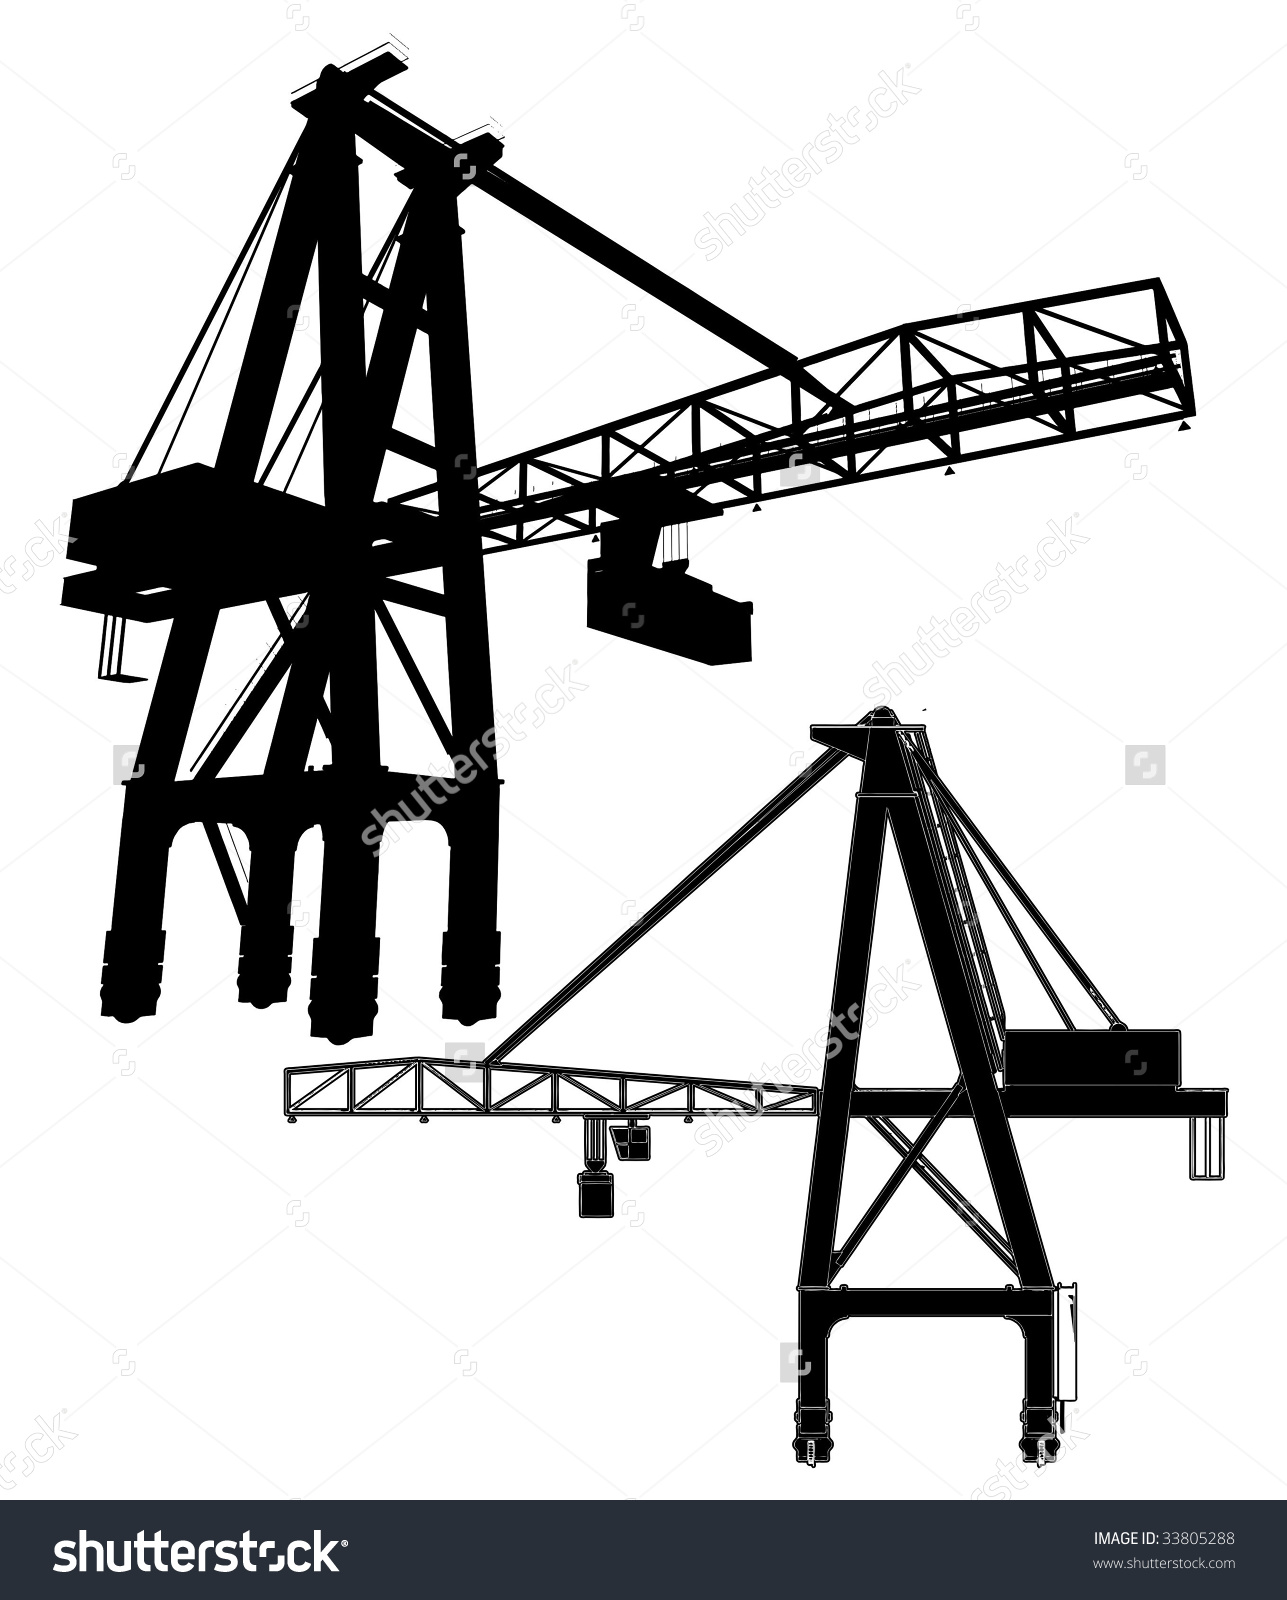 Gantry Crane Vector 01 Stock Vector 33805288.